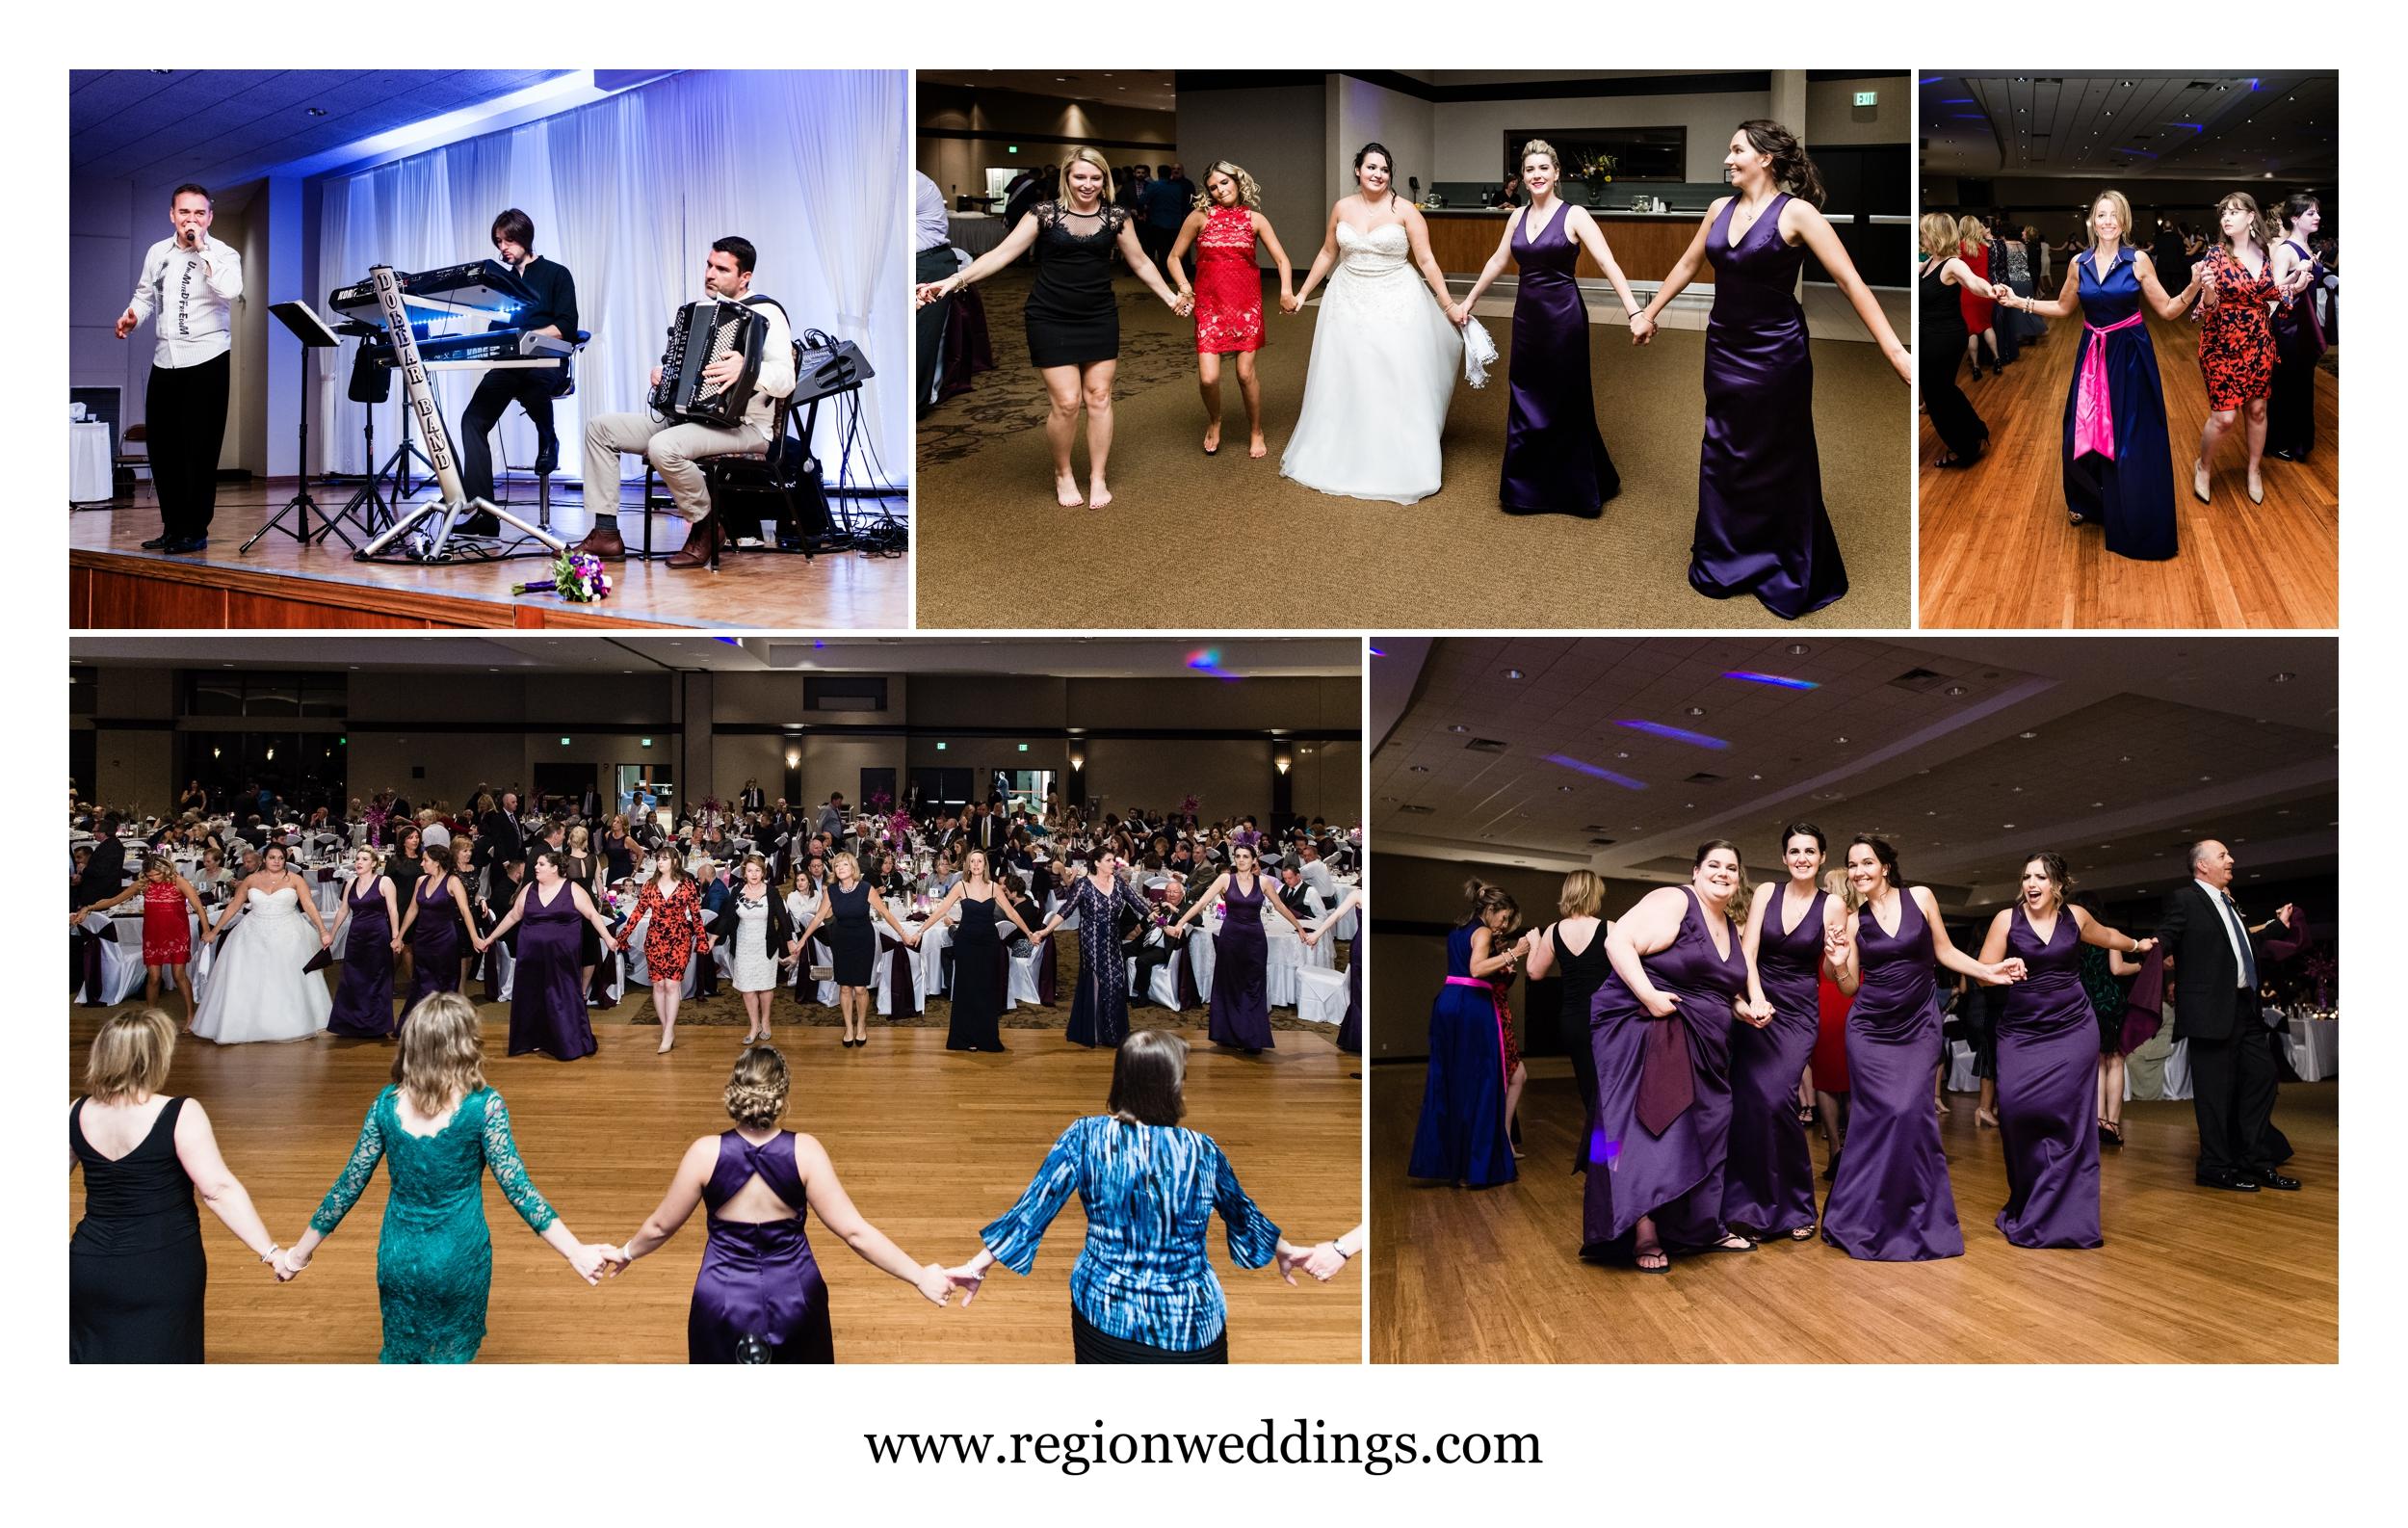 Serbian wedding reception celebration at Halls of St. George.